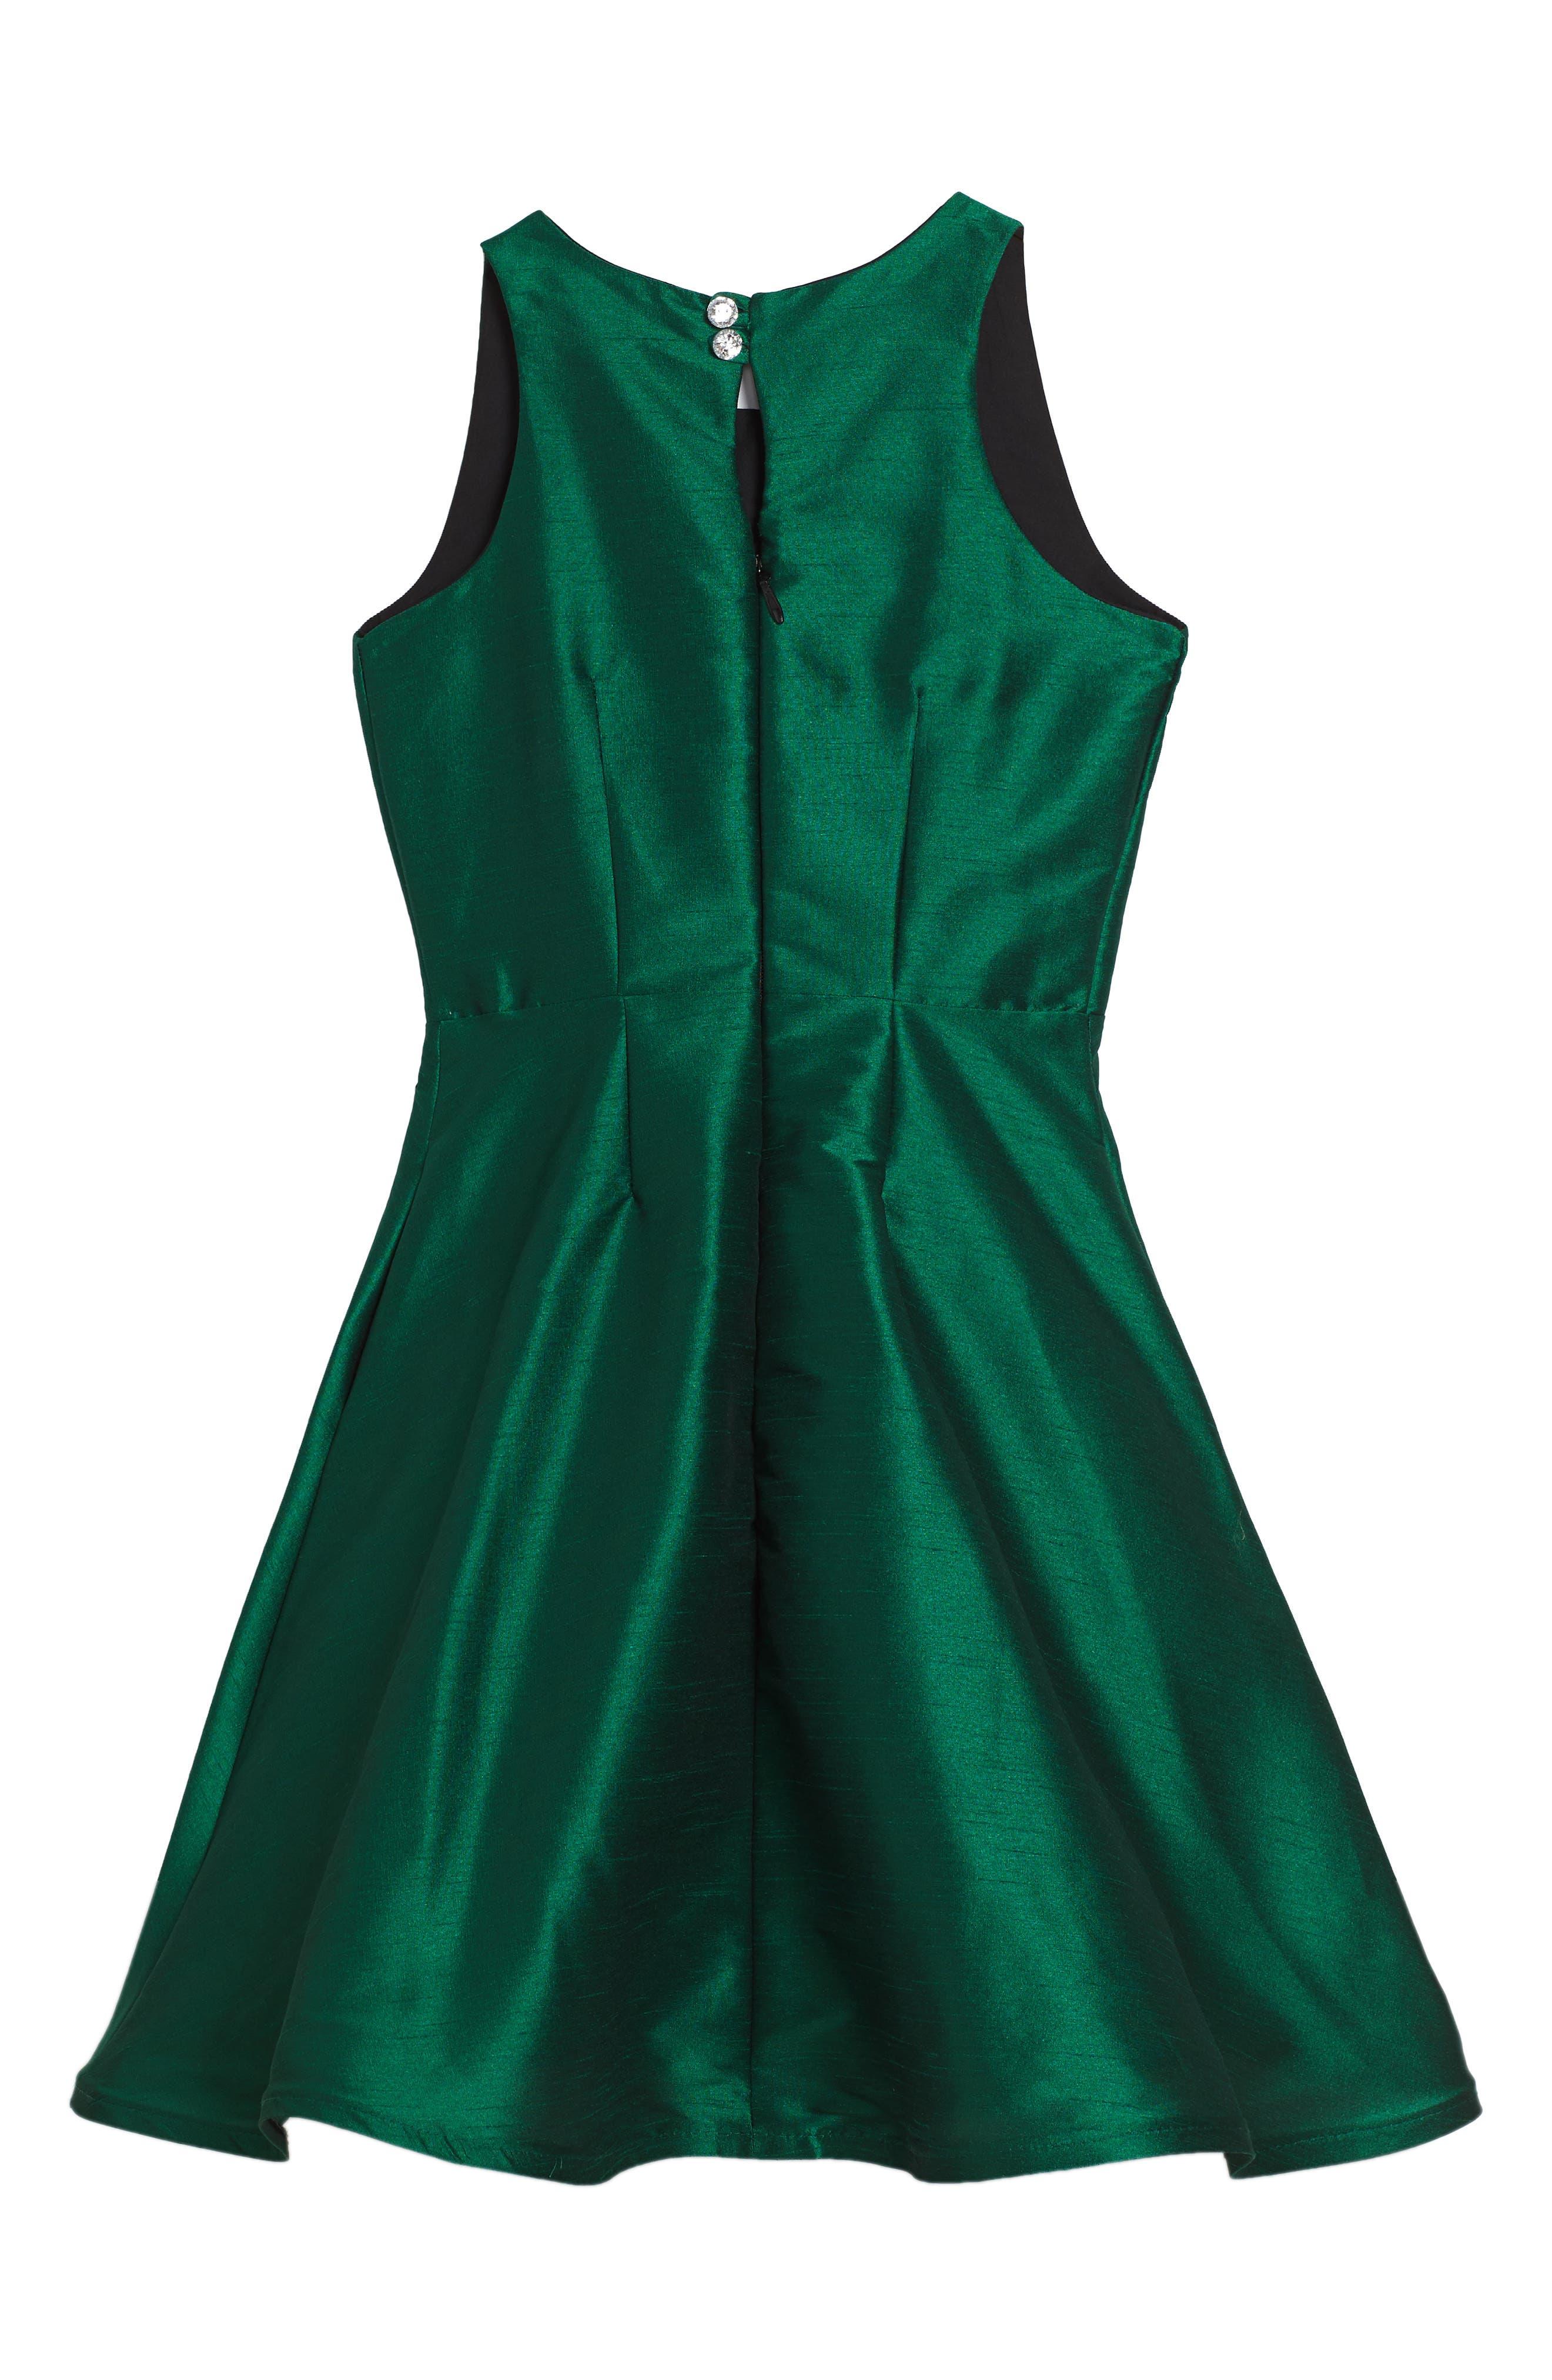 Alternate Image 2  - Fiveloaves Twofish Holiday Beauty Sleeveless Dress (Big Girls)